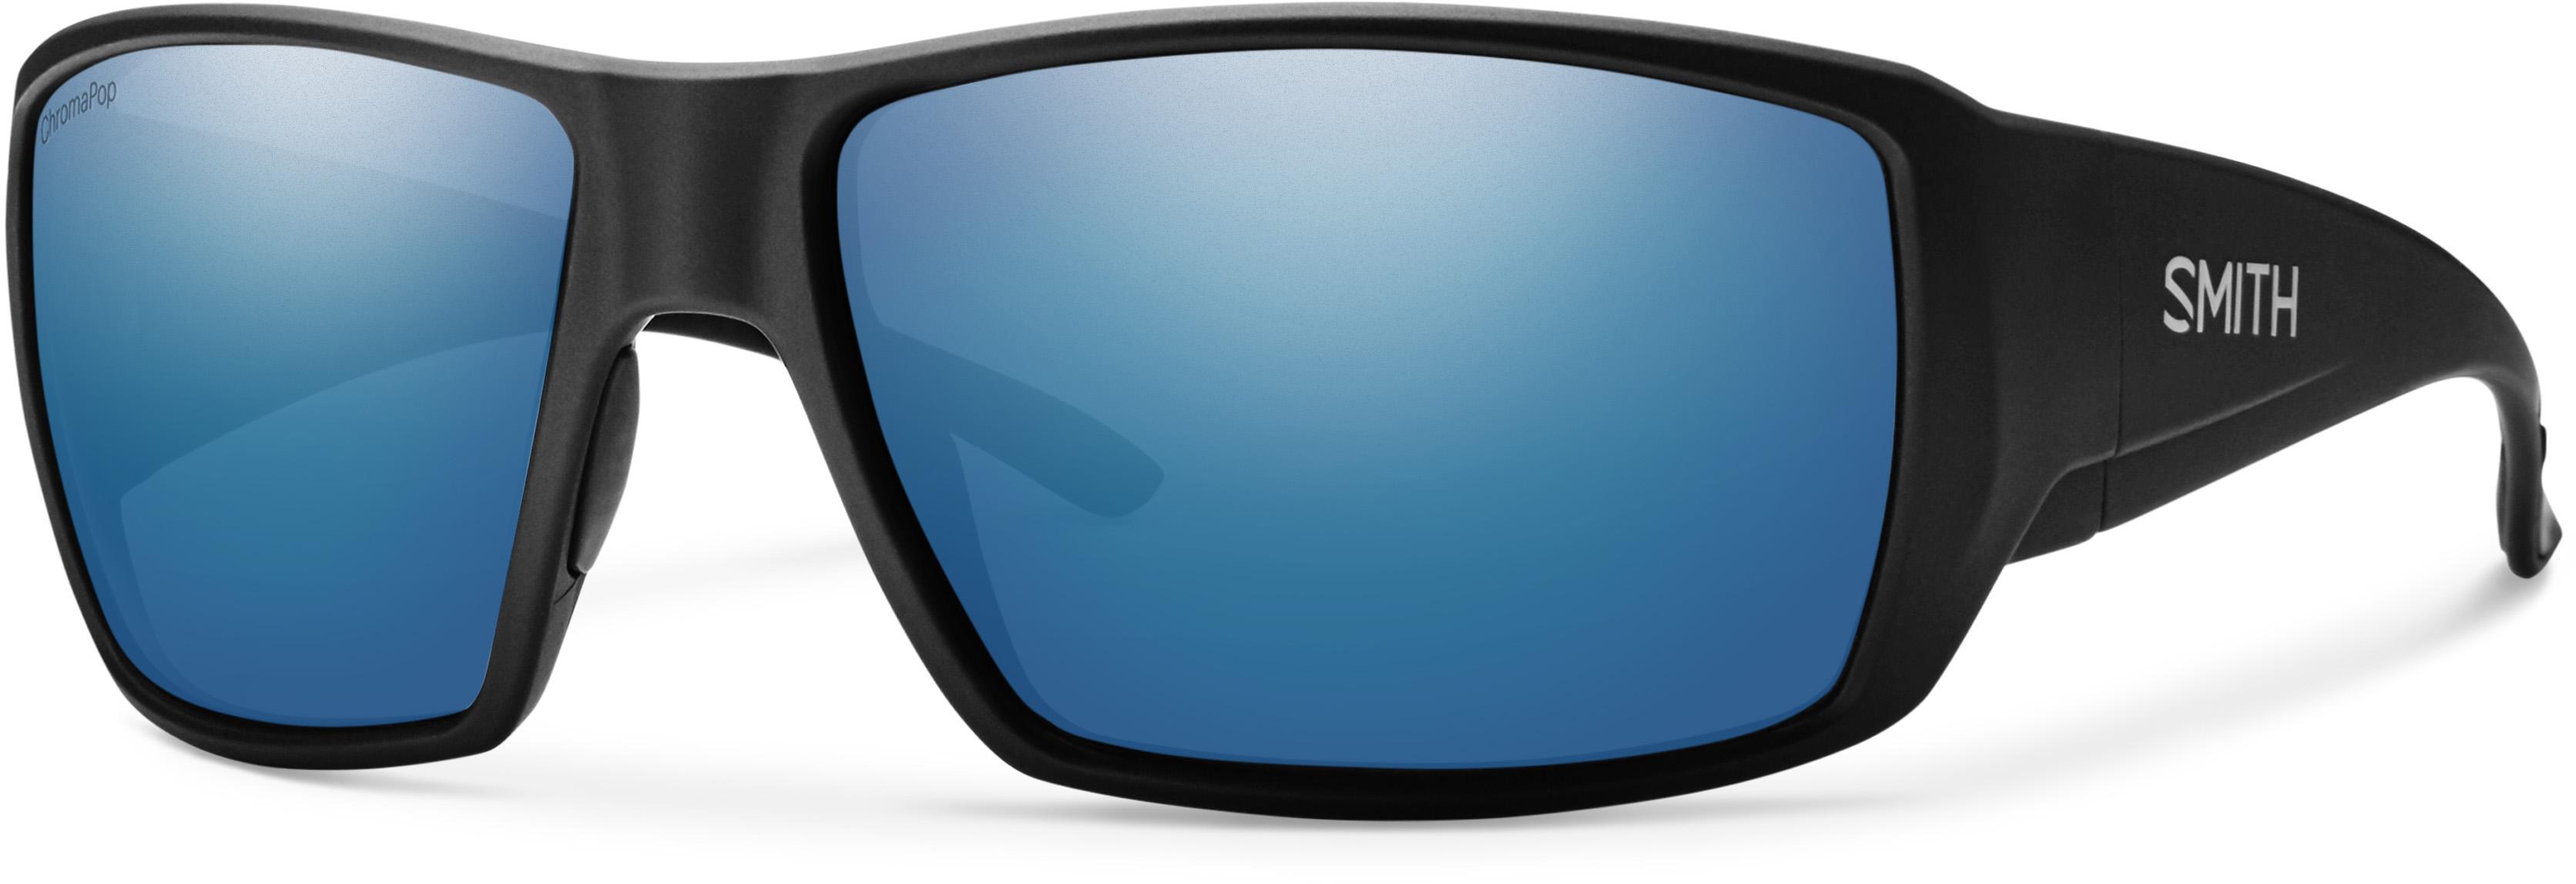 16b949fc29 Smith Guide s Choice Matte Black ChromaPop Blue Mirror Polarized -  Sunglasses - Protections